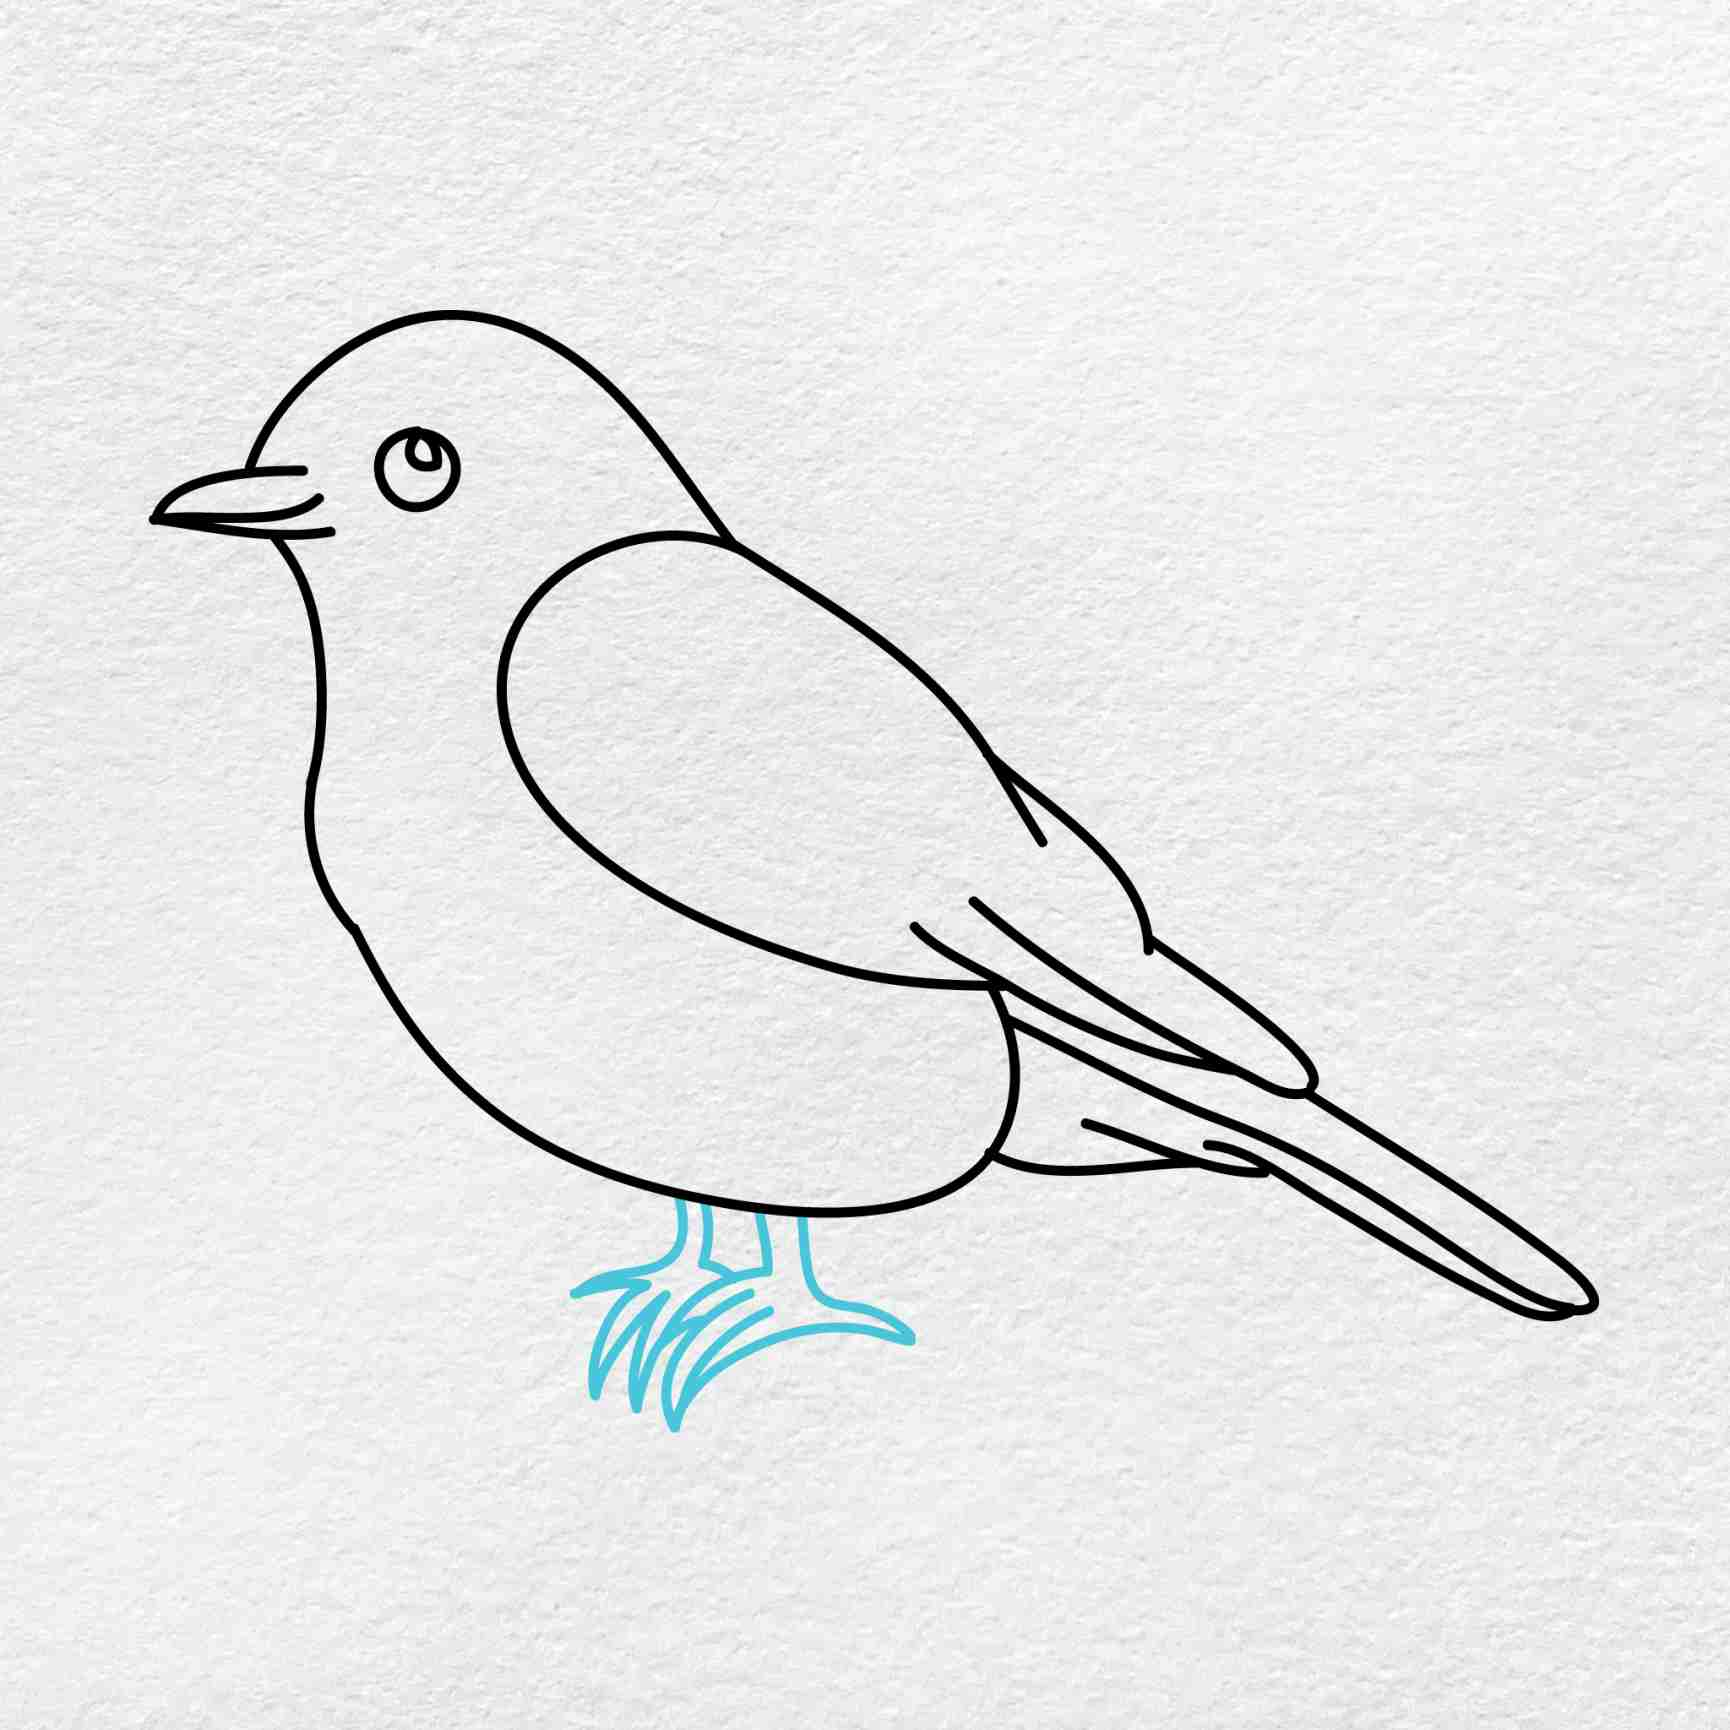 Bluebird Drawing: Step 5